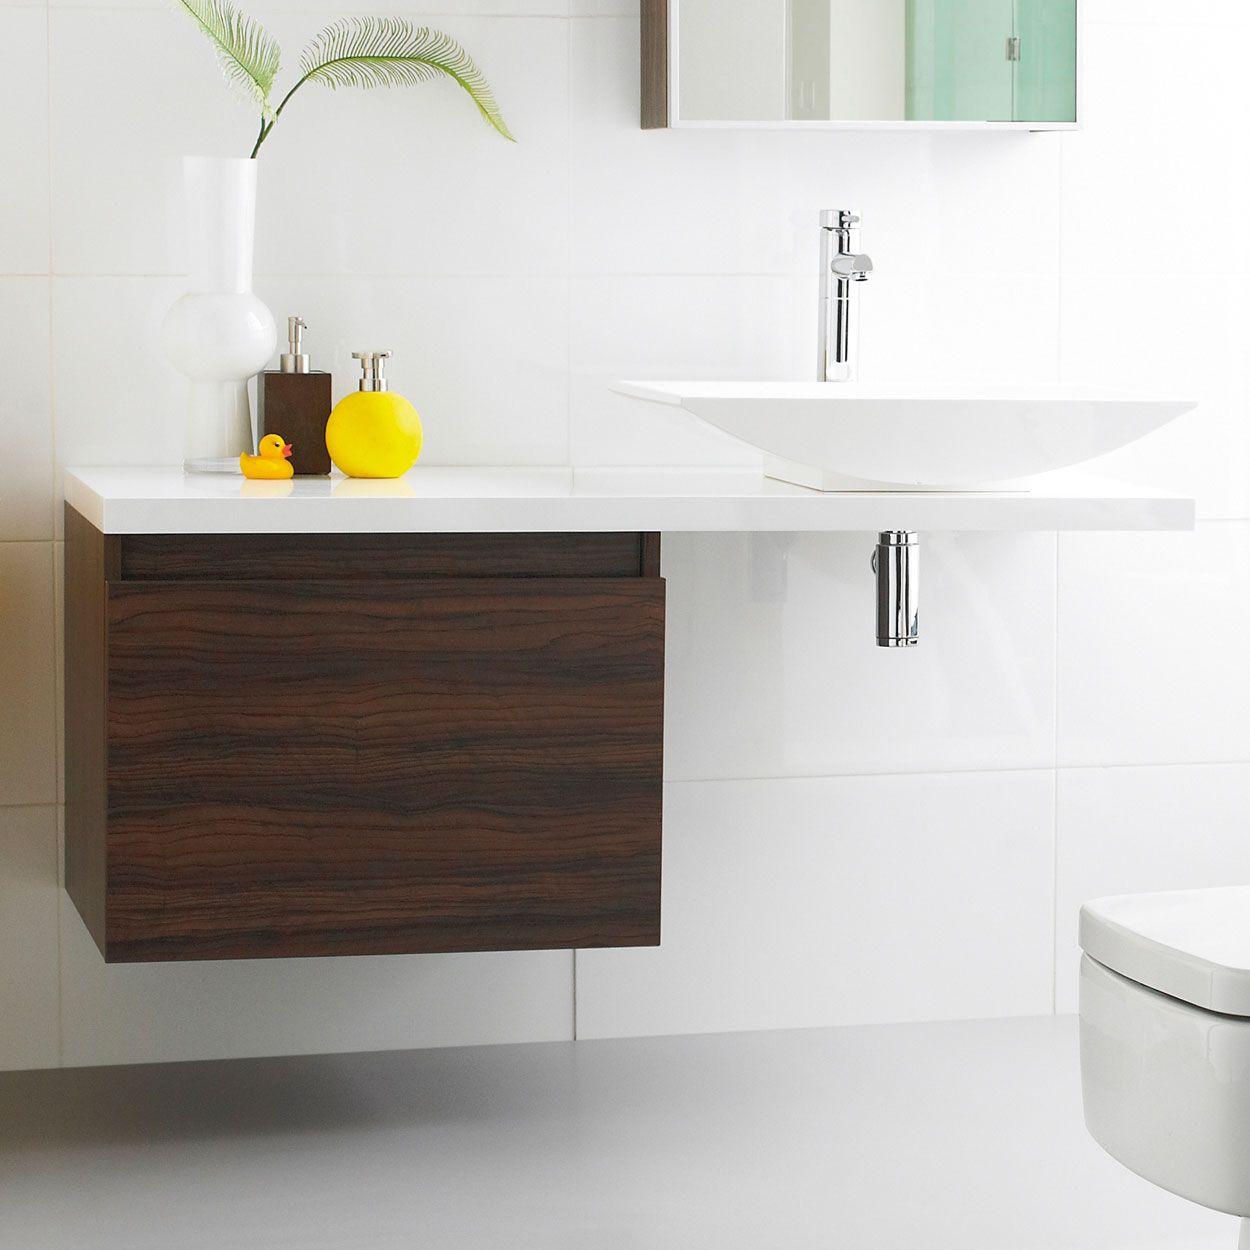 prague wall mounted bathroom vanity unit and basin 1200mm wide walnut